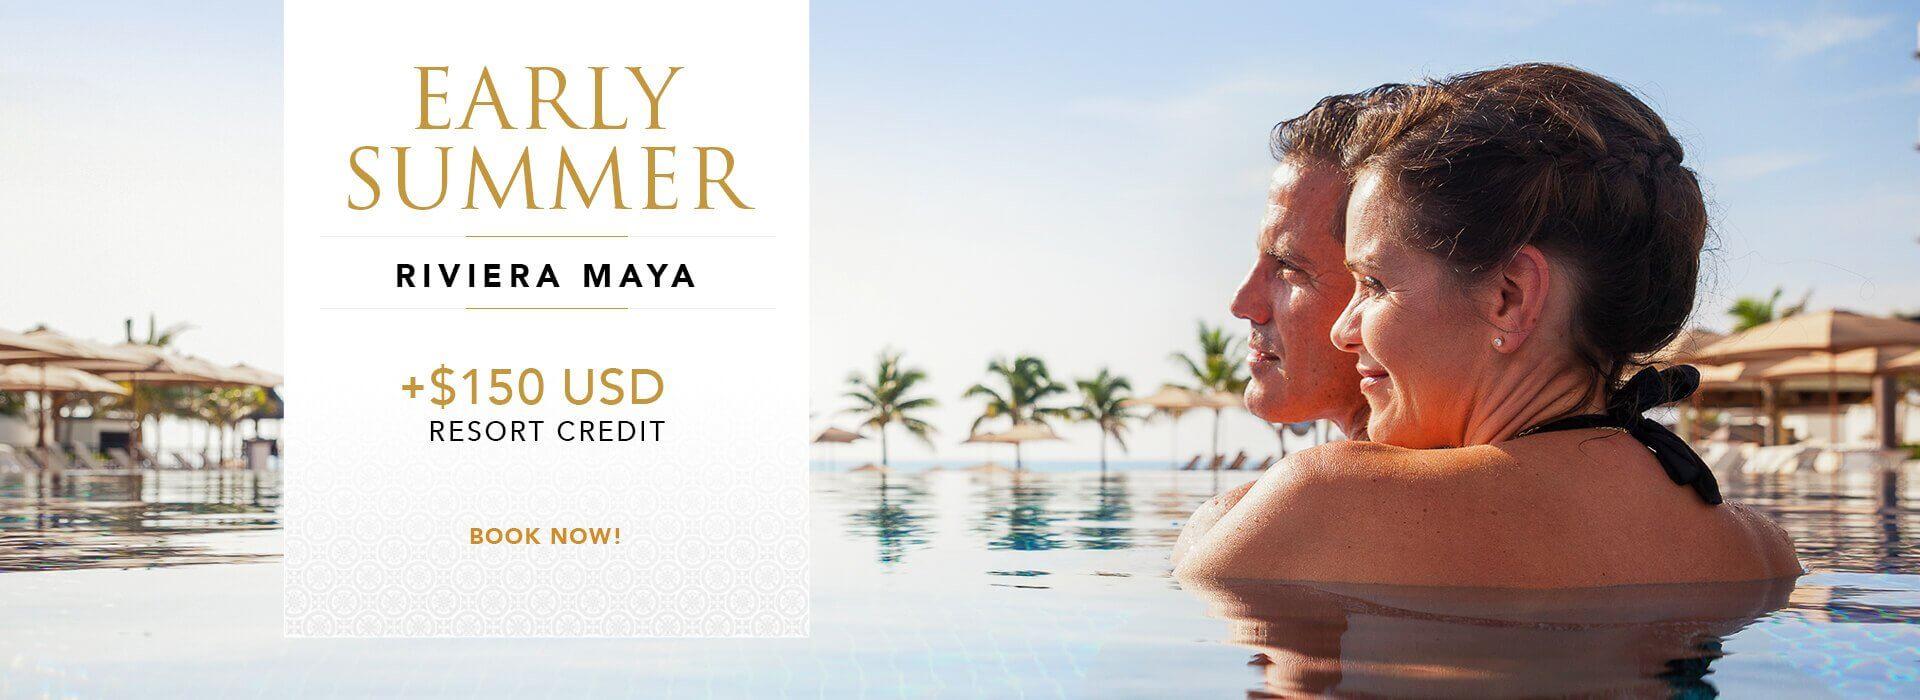 Early Summer vacation deal in Riviera Maya